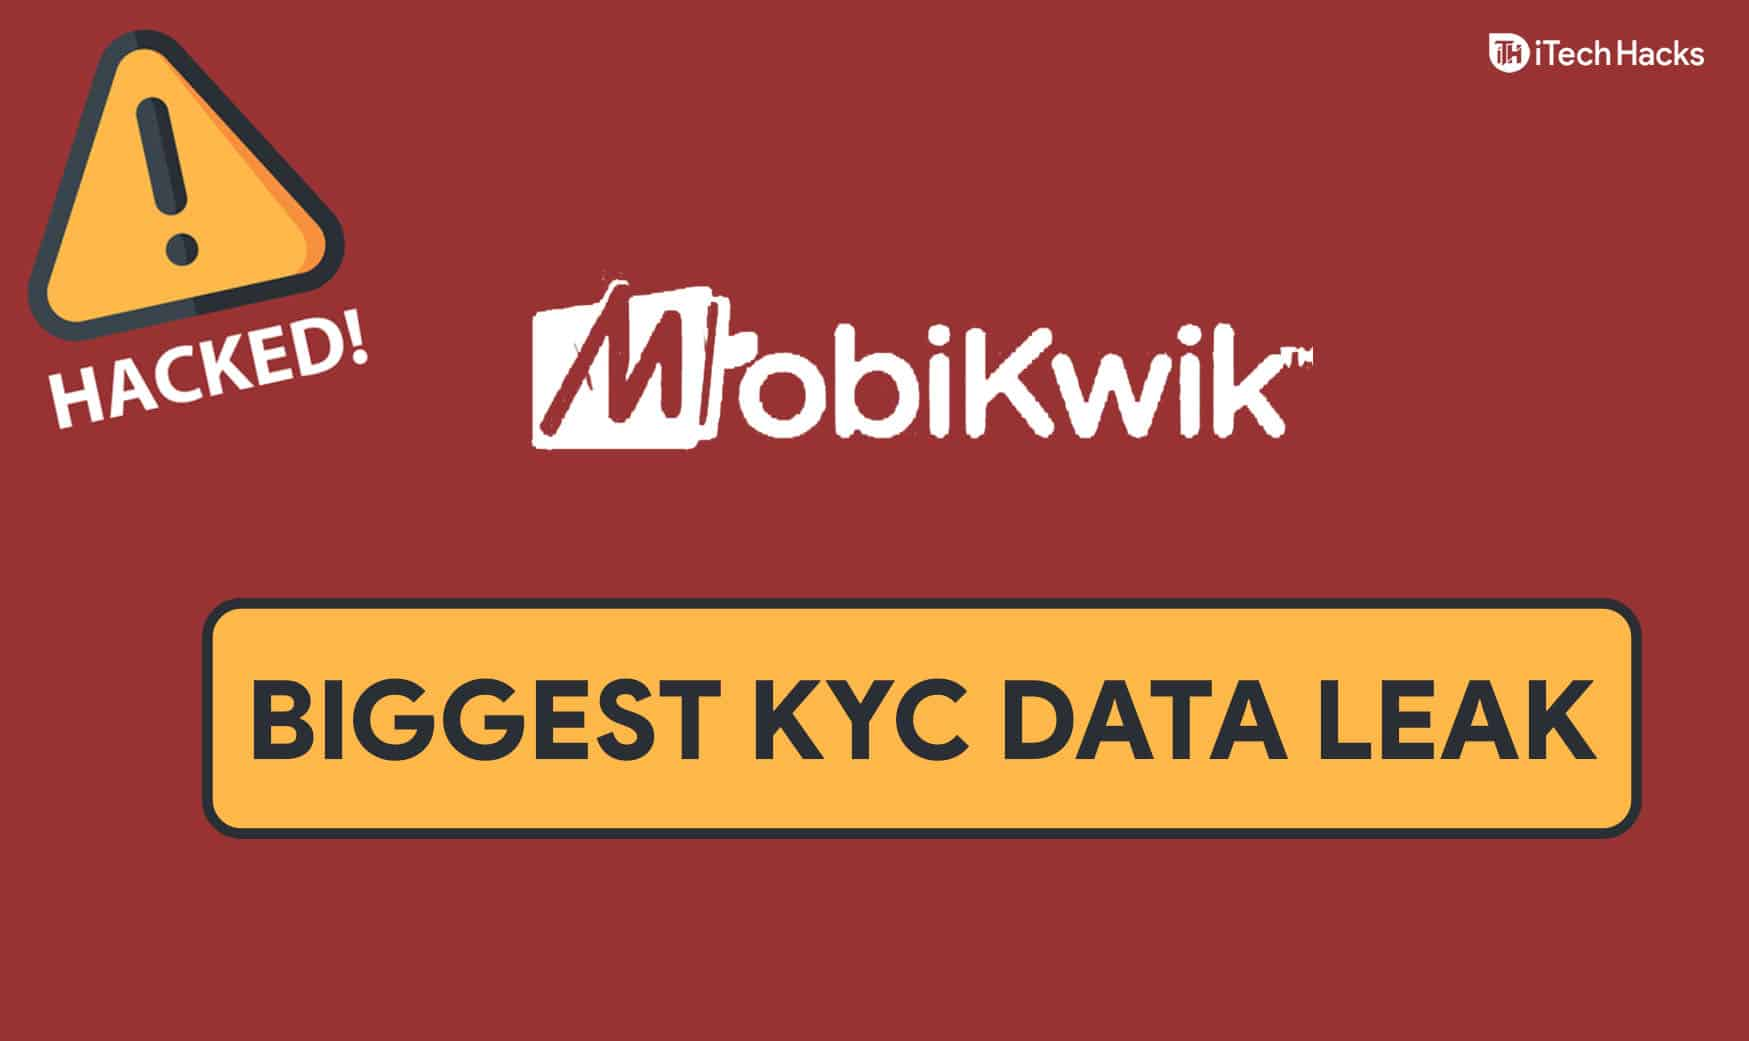 MobiKwik: The Biggest KYC Data Leak in the History